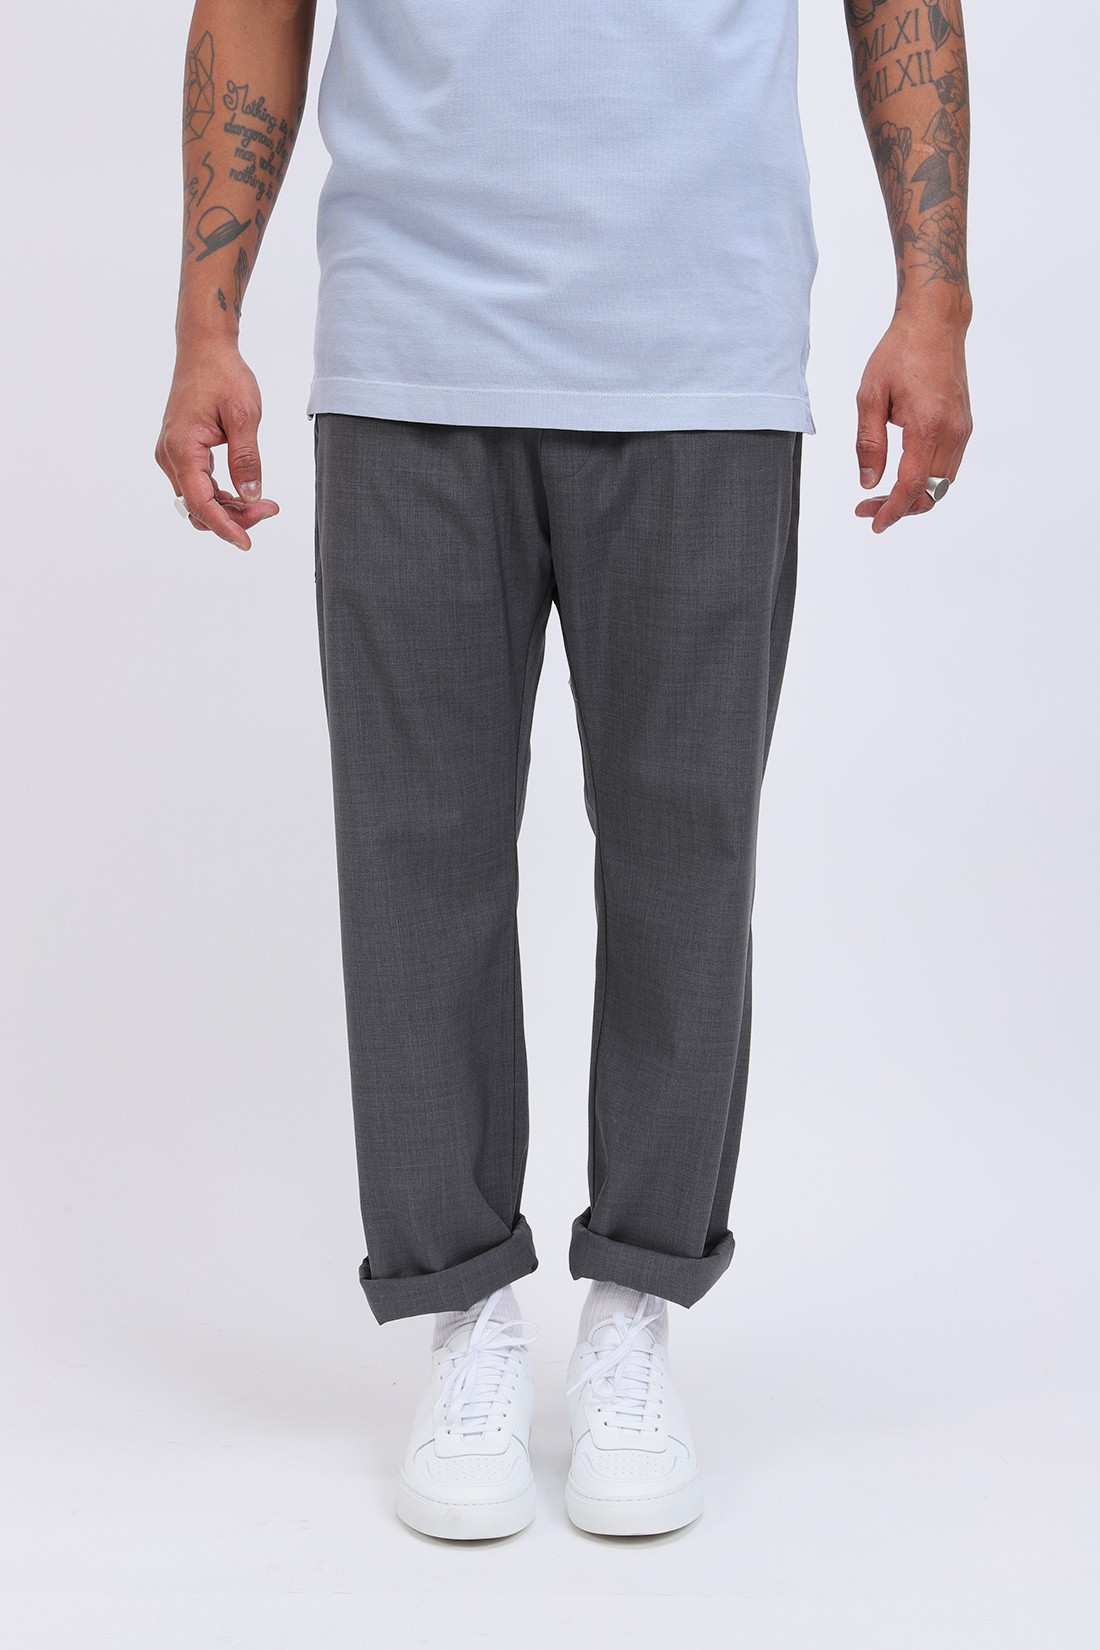 BARENA / Pantalone bativoga tela Grigio